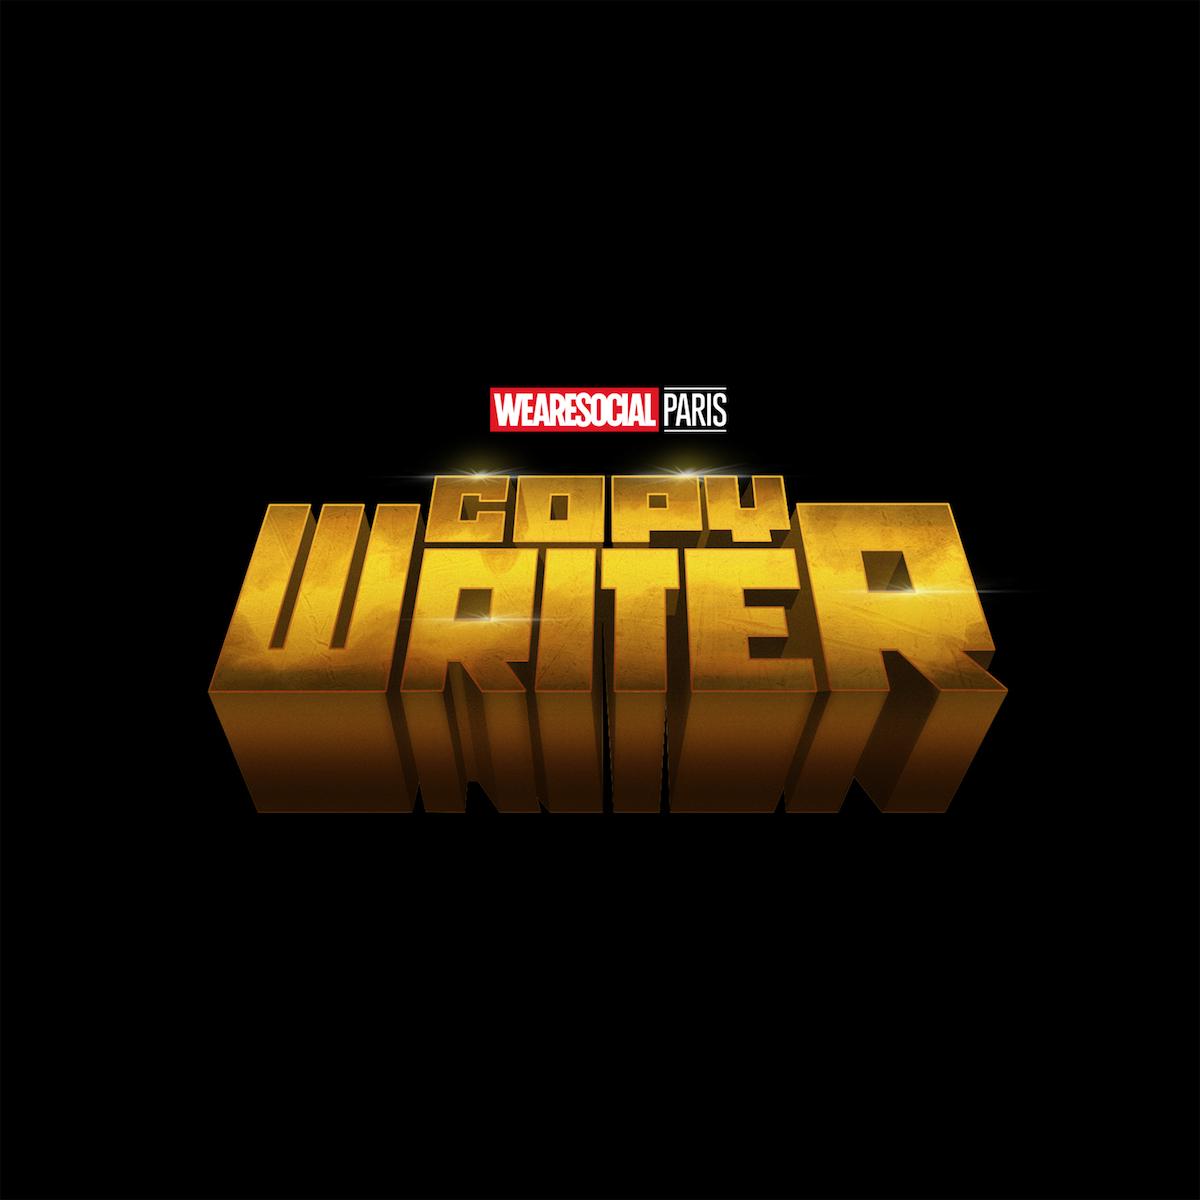 Superhero Logos for creative agency job titles - Copywriter / Luke Cage